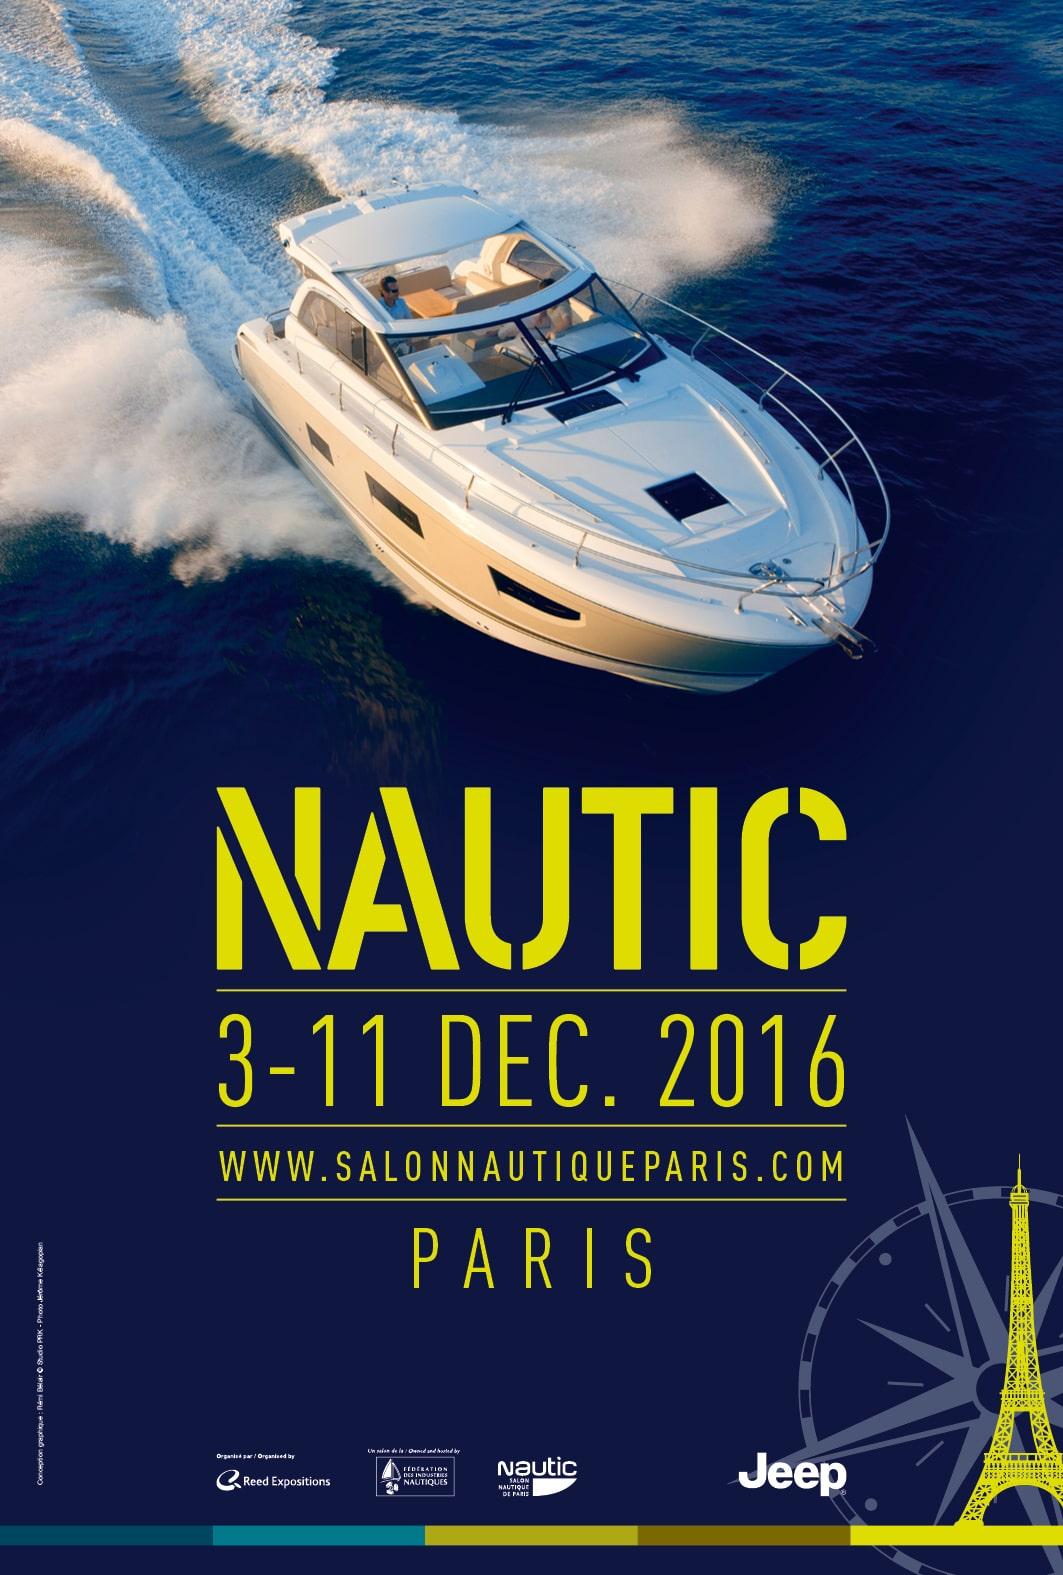 salon nautic affiche 2016 bateau